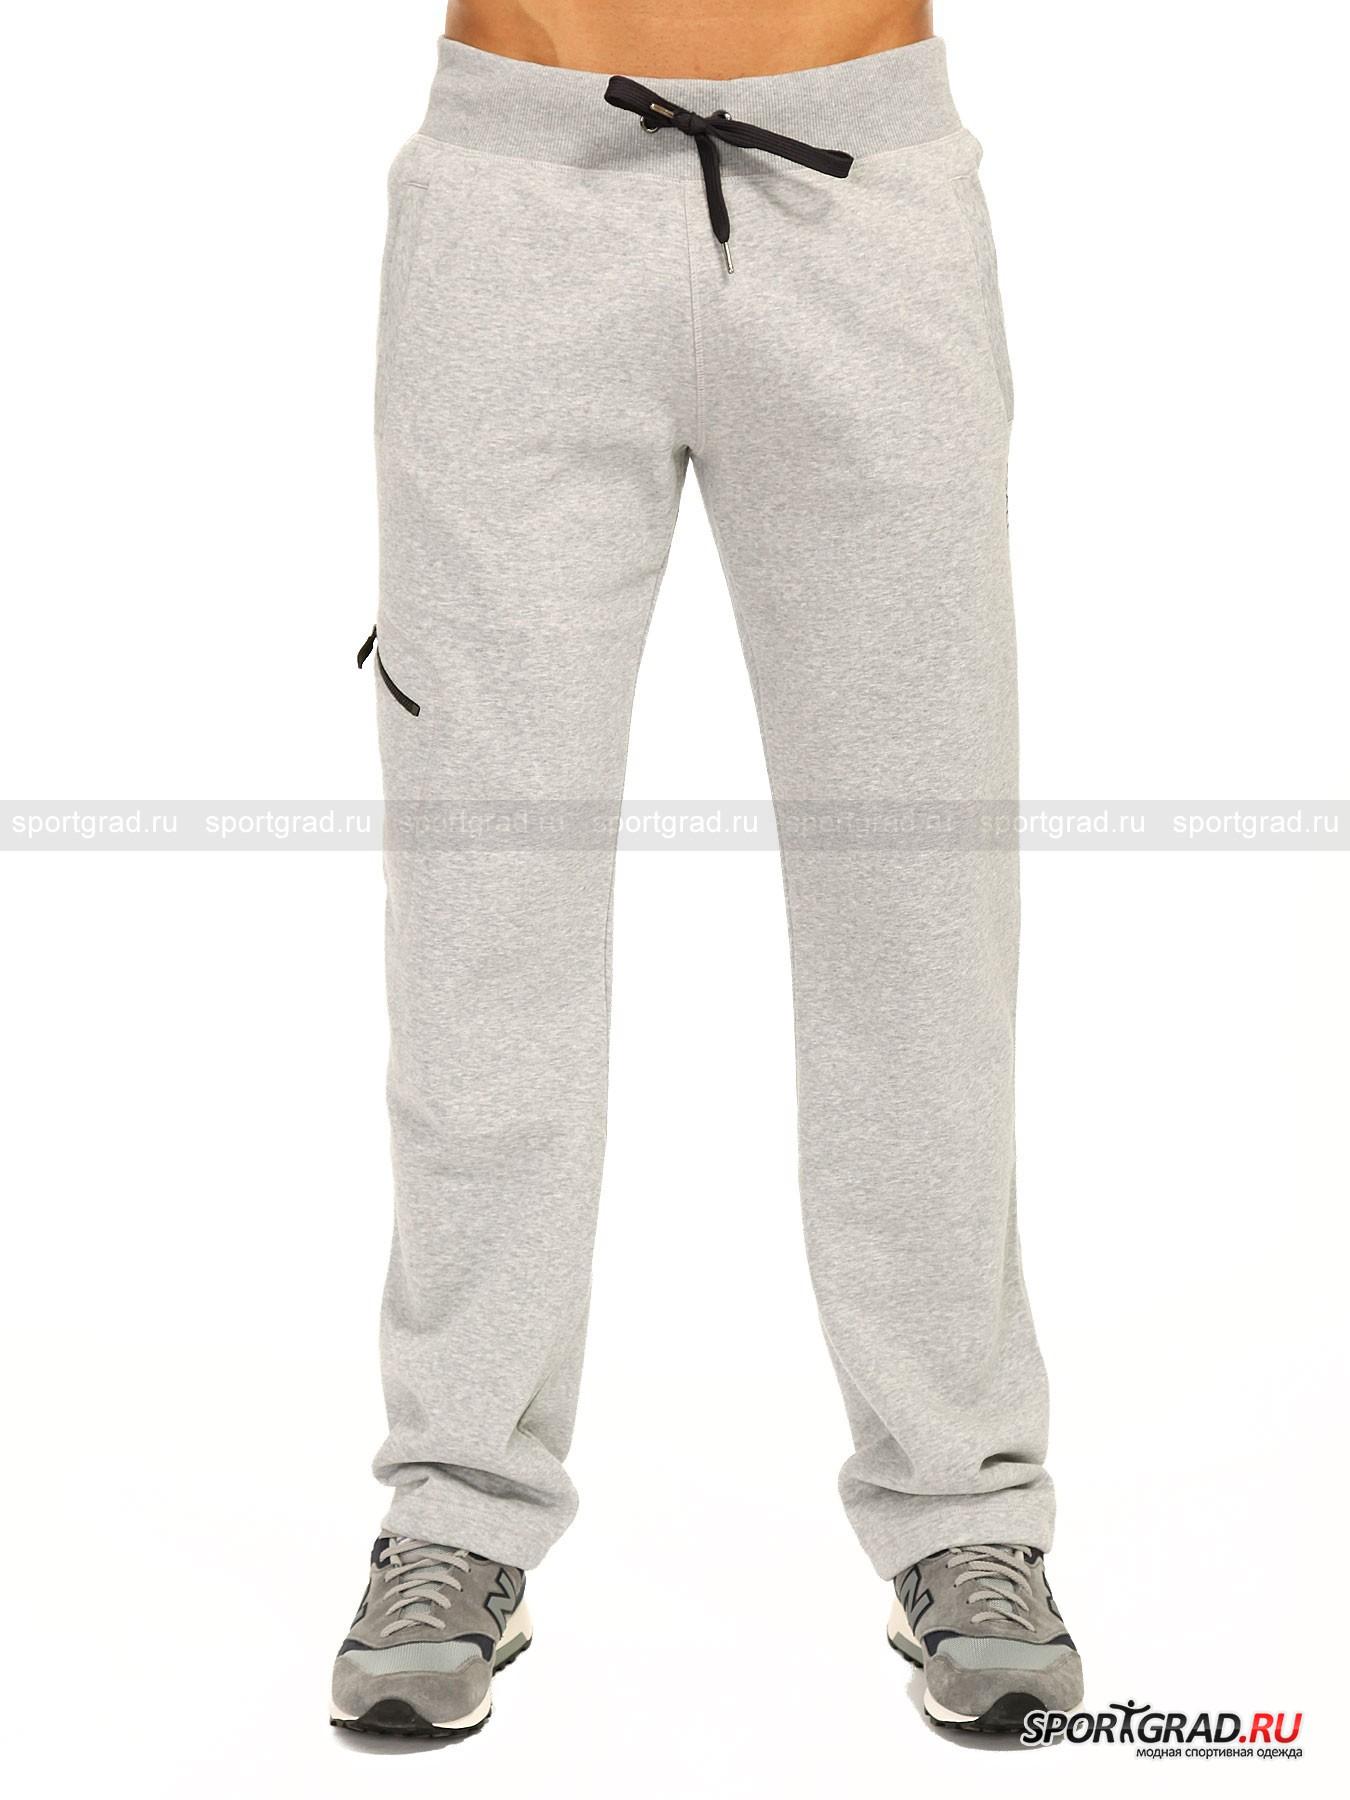 ����� ������� ���������� Core pants CASALL � �������